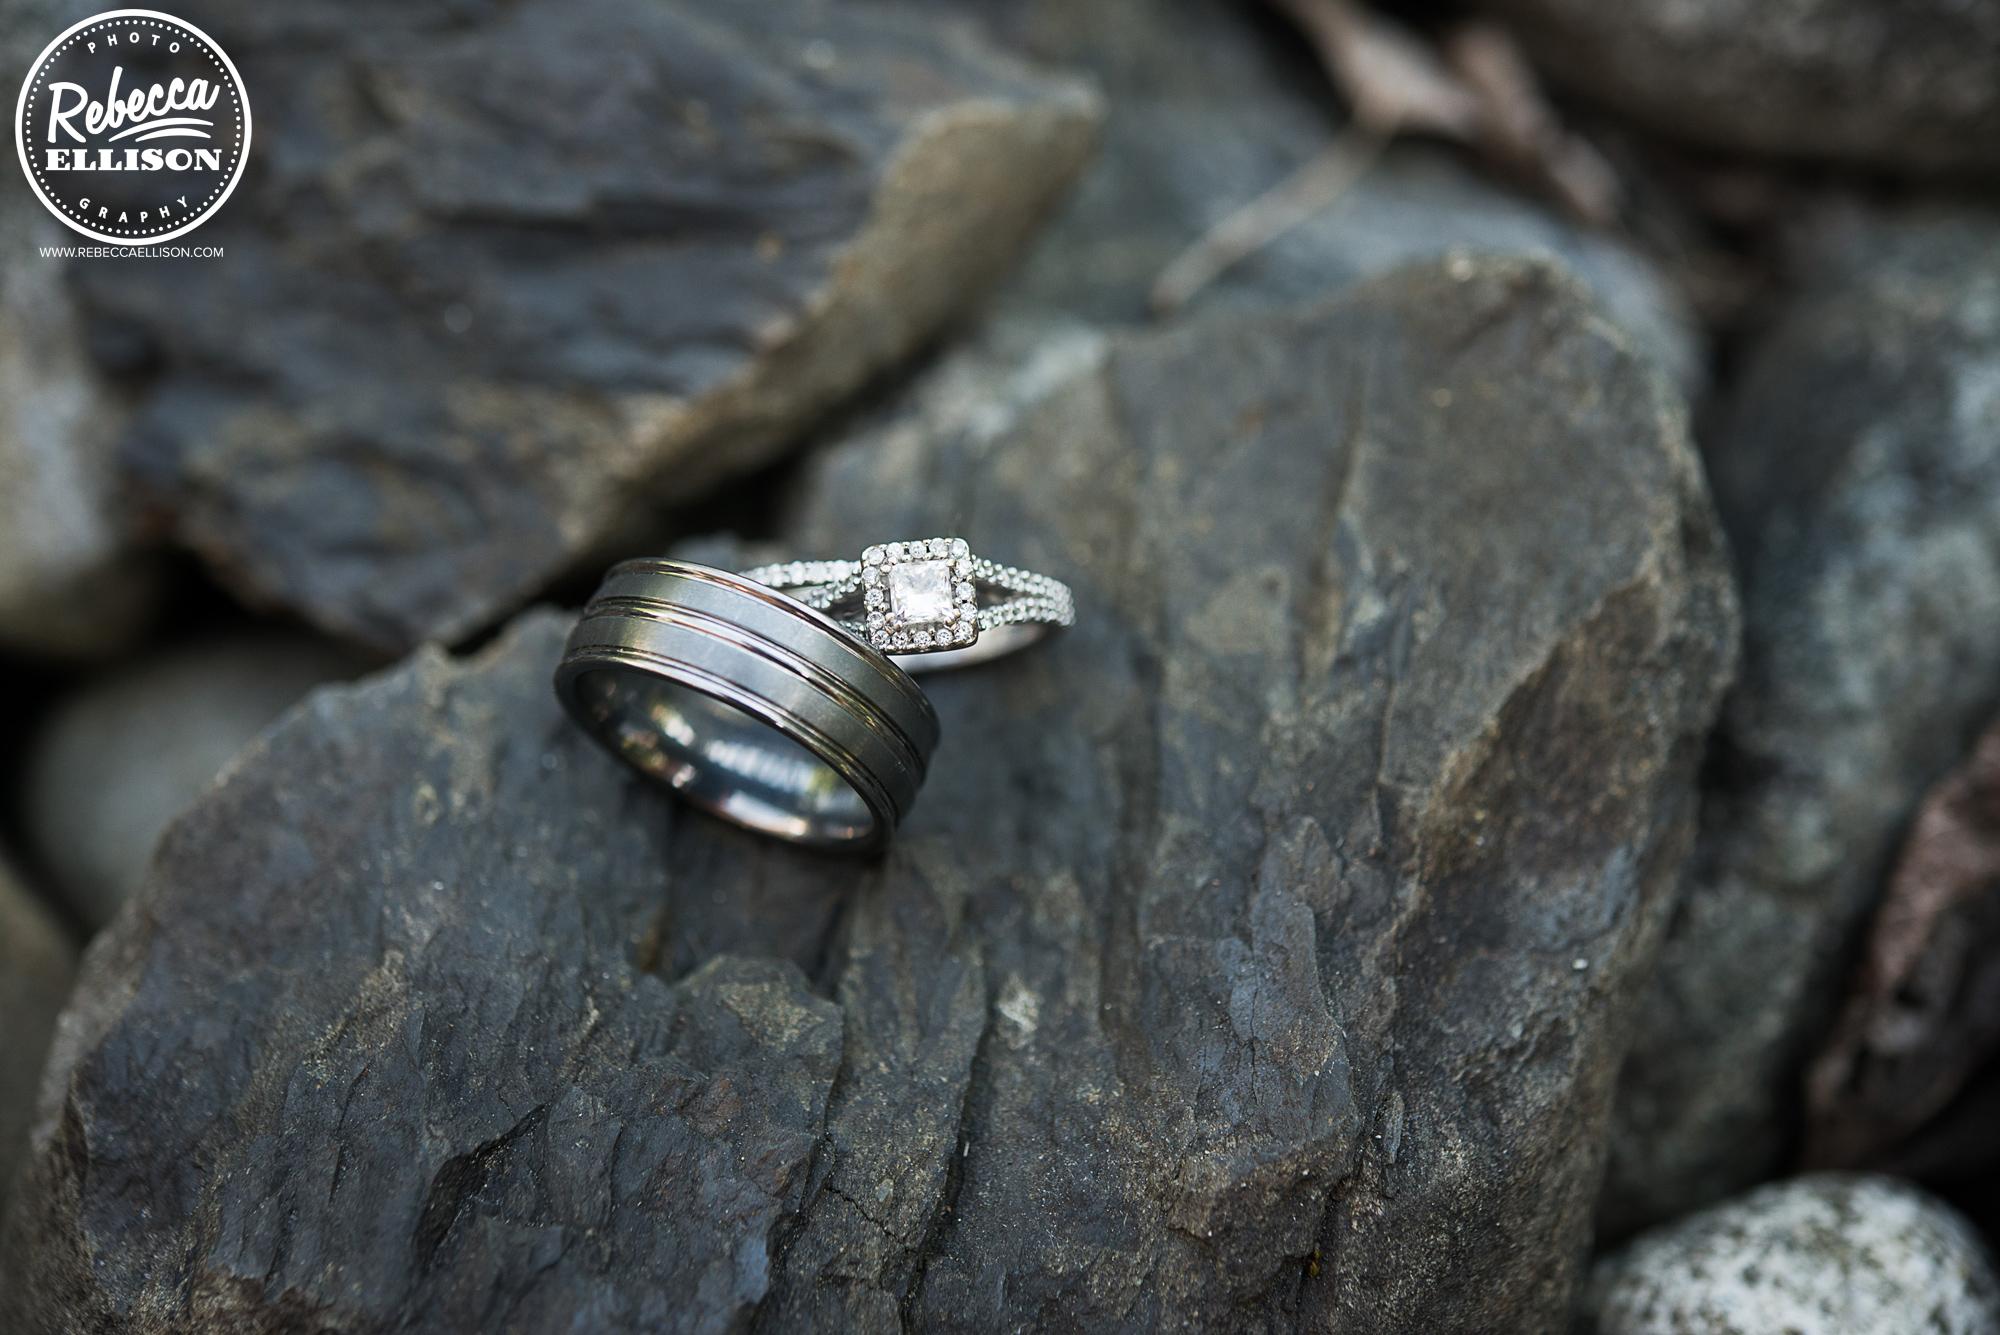 Wedding rings laying on rocks photographed by Seattle wedding photographer Rebecca Ellison